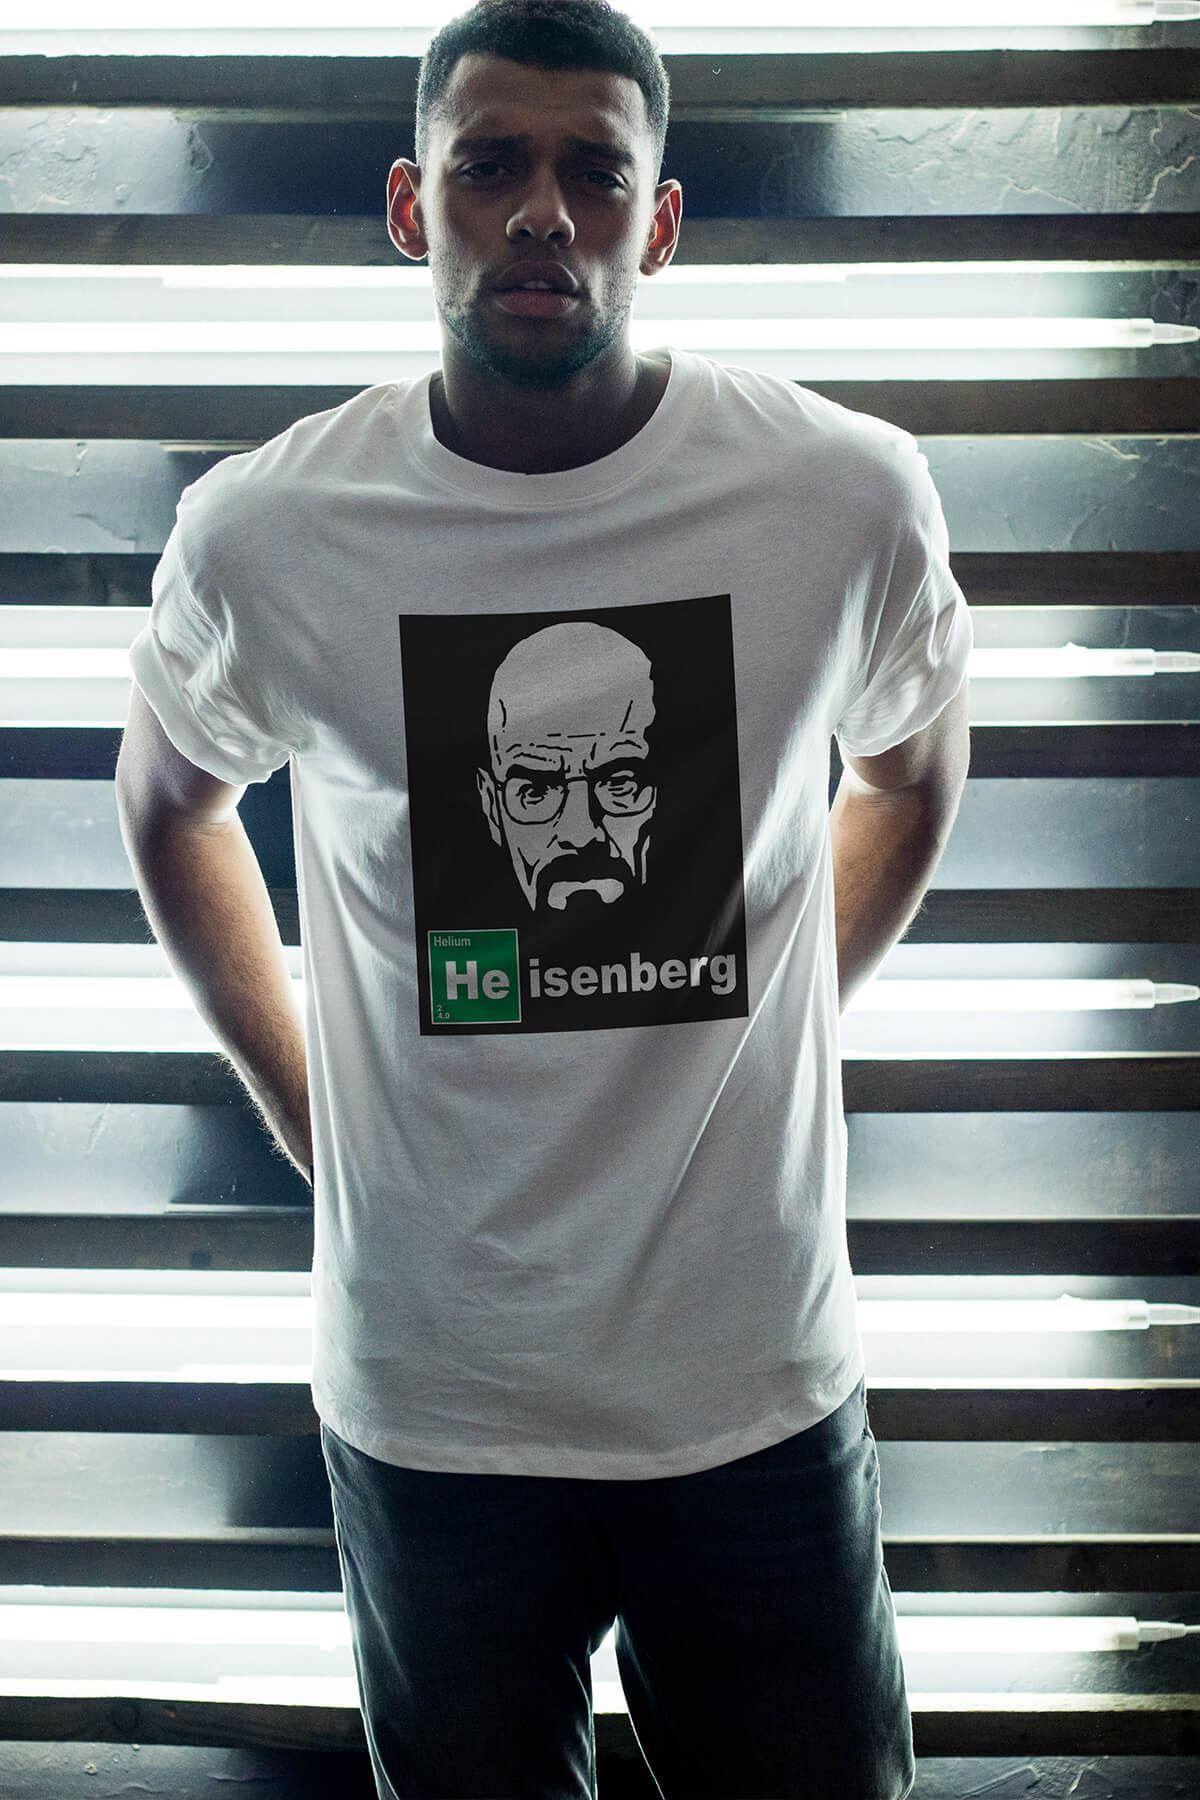 Breaking Bad Heisenberg 13 Beyaz Erkek Oversize Tshirt - Tişört